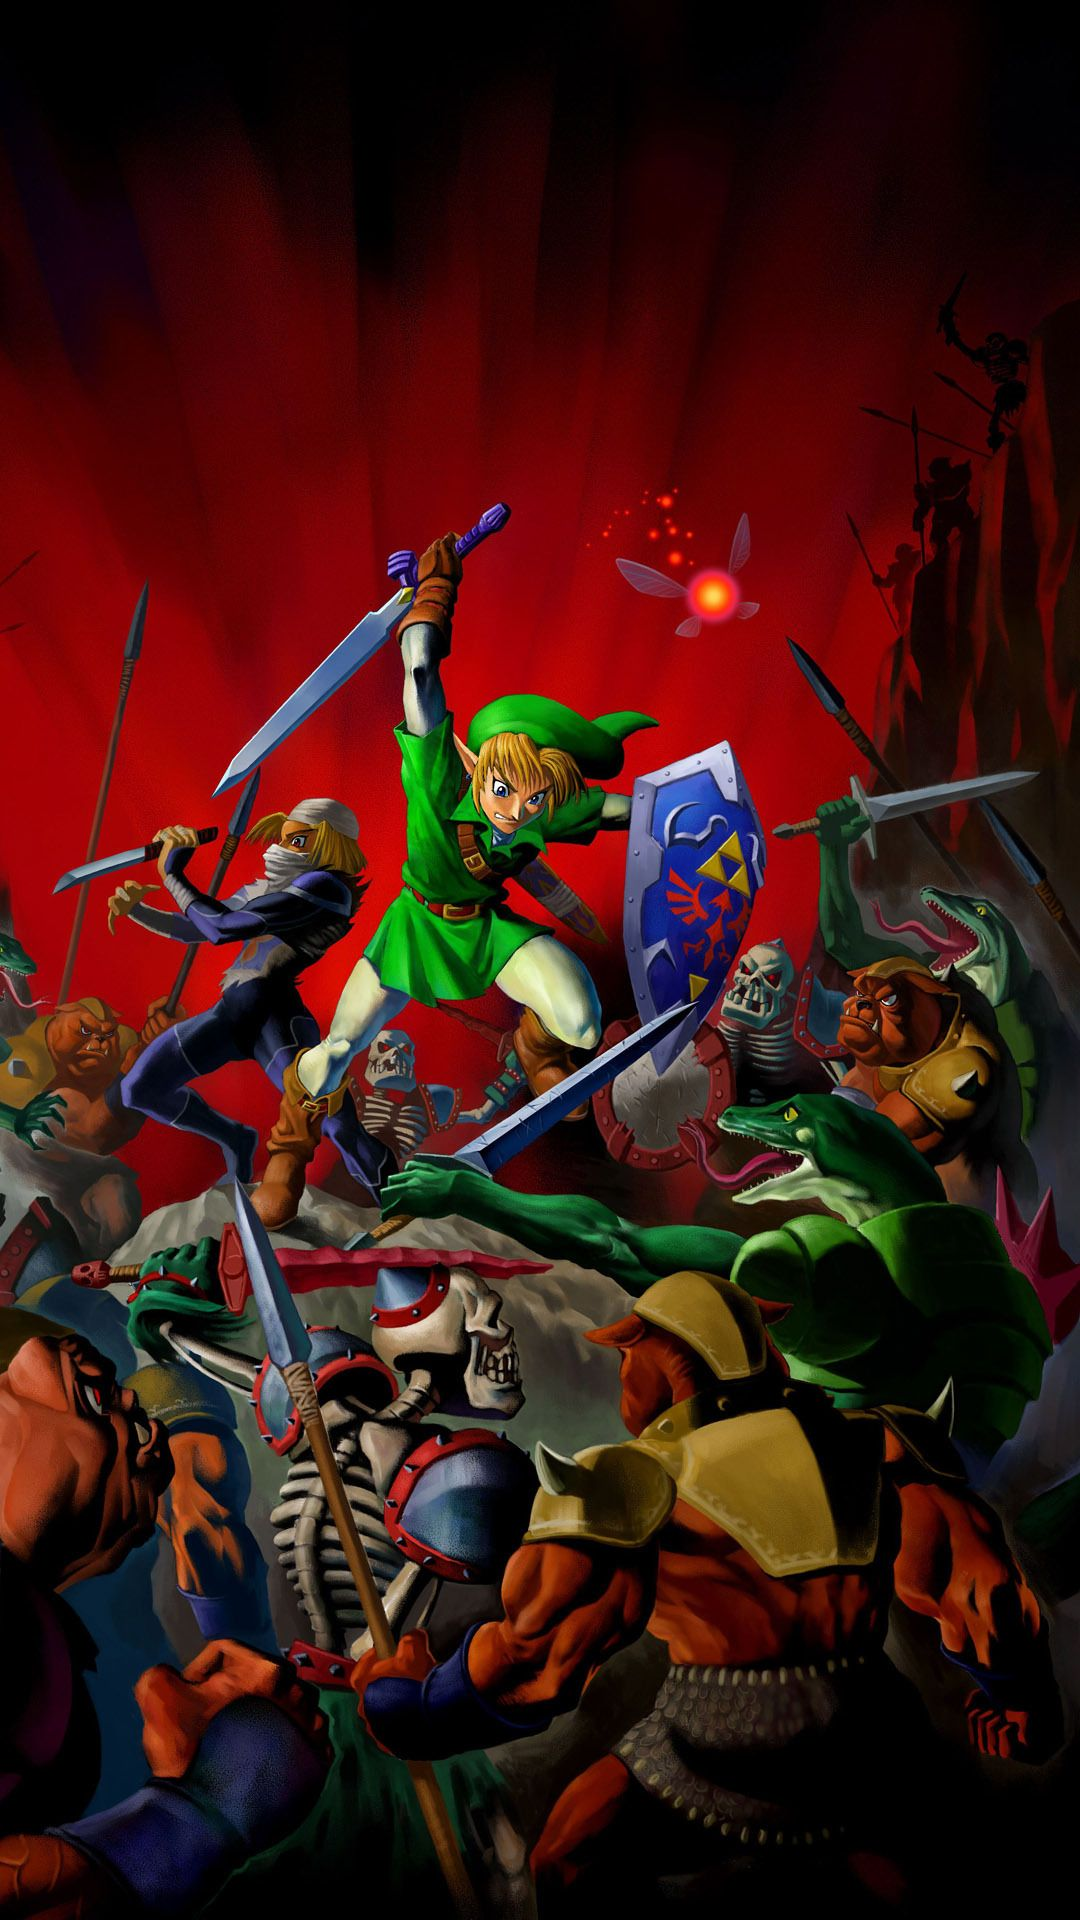 Legend Of Zelda Wallpaper Phone Hd 300854 Hd Wallpaper